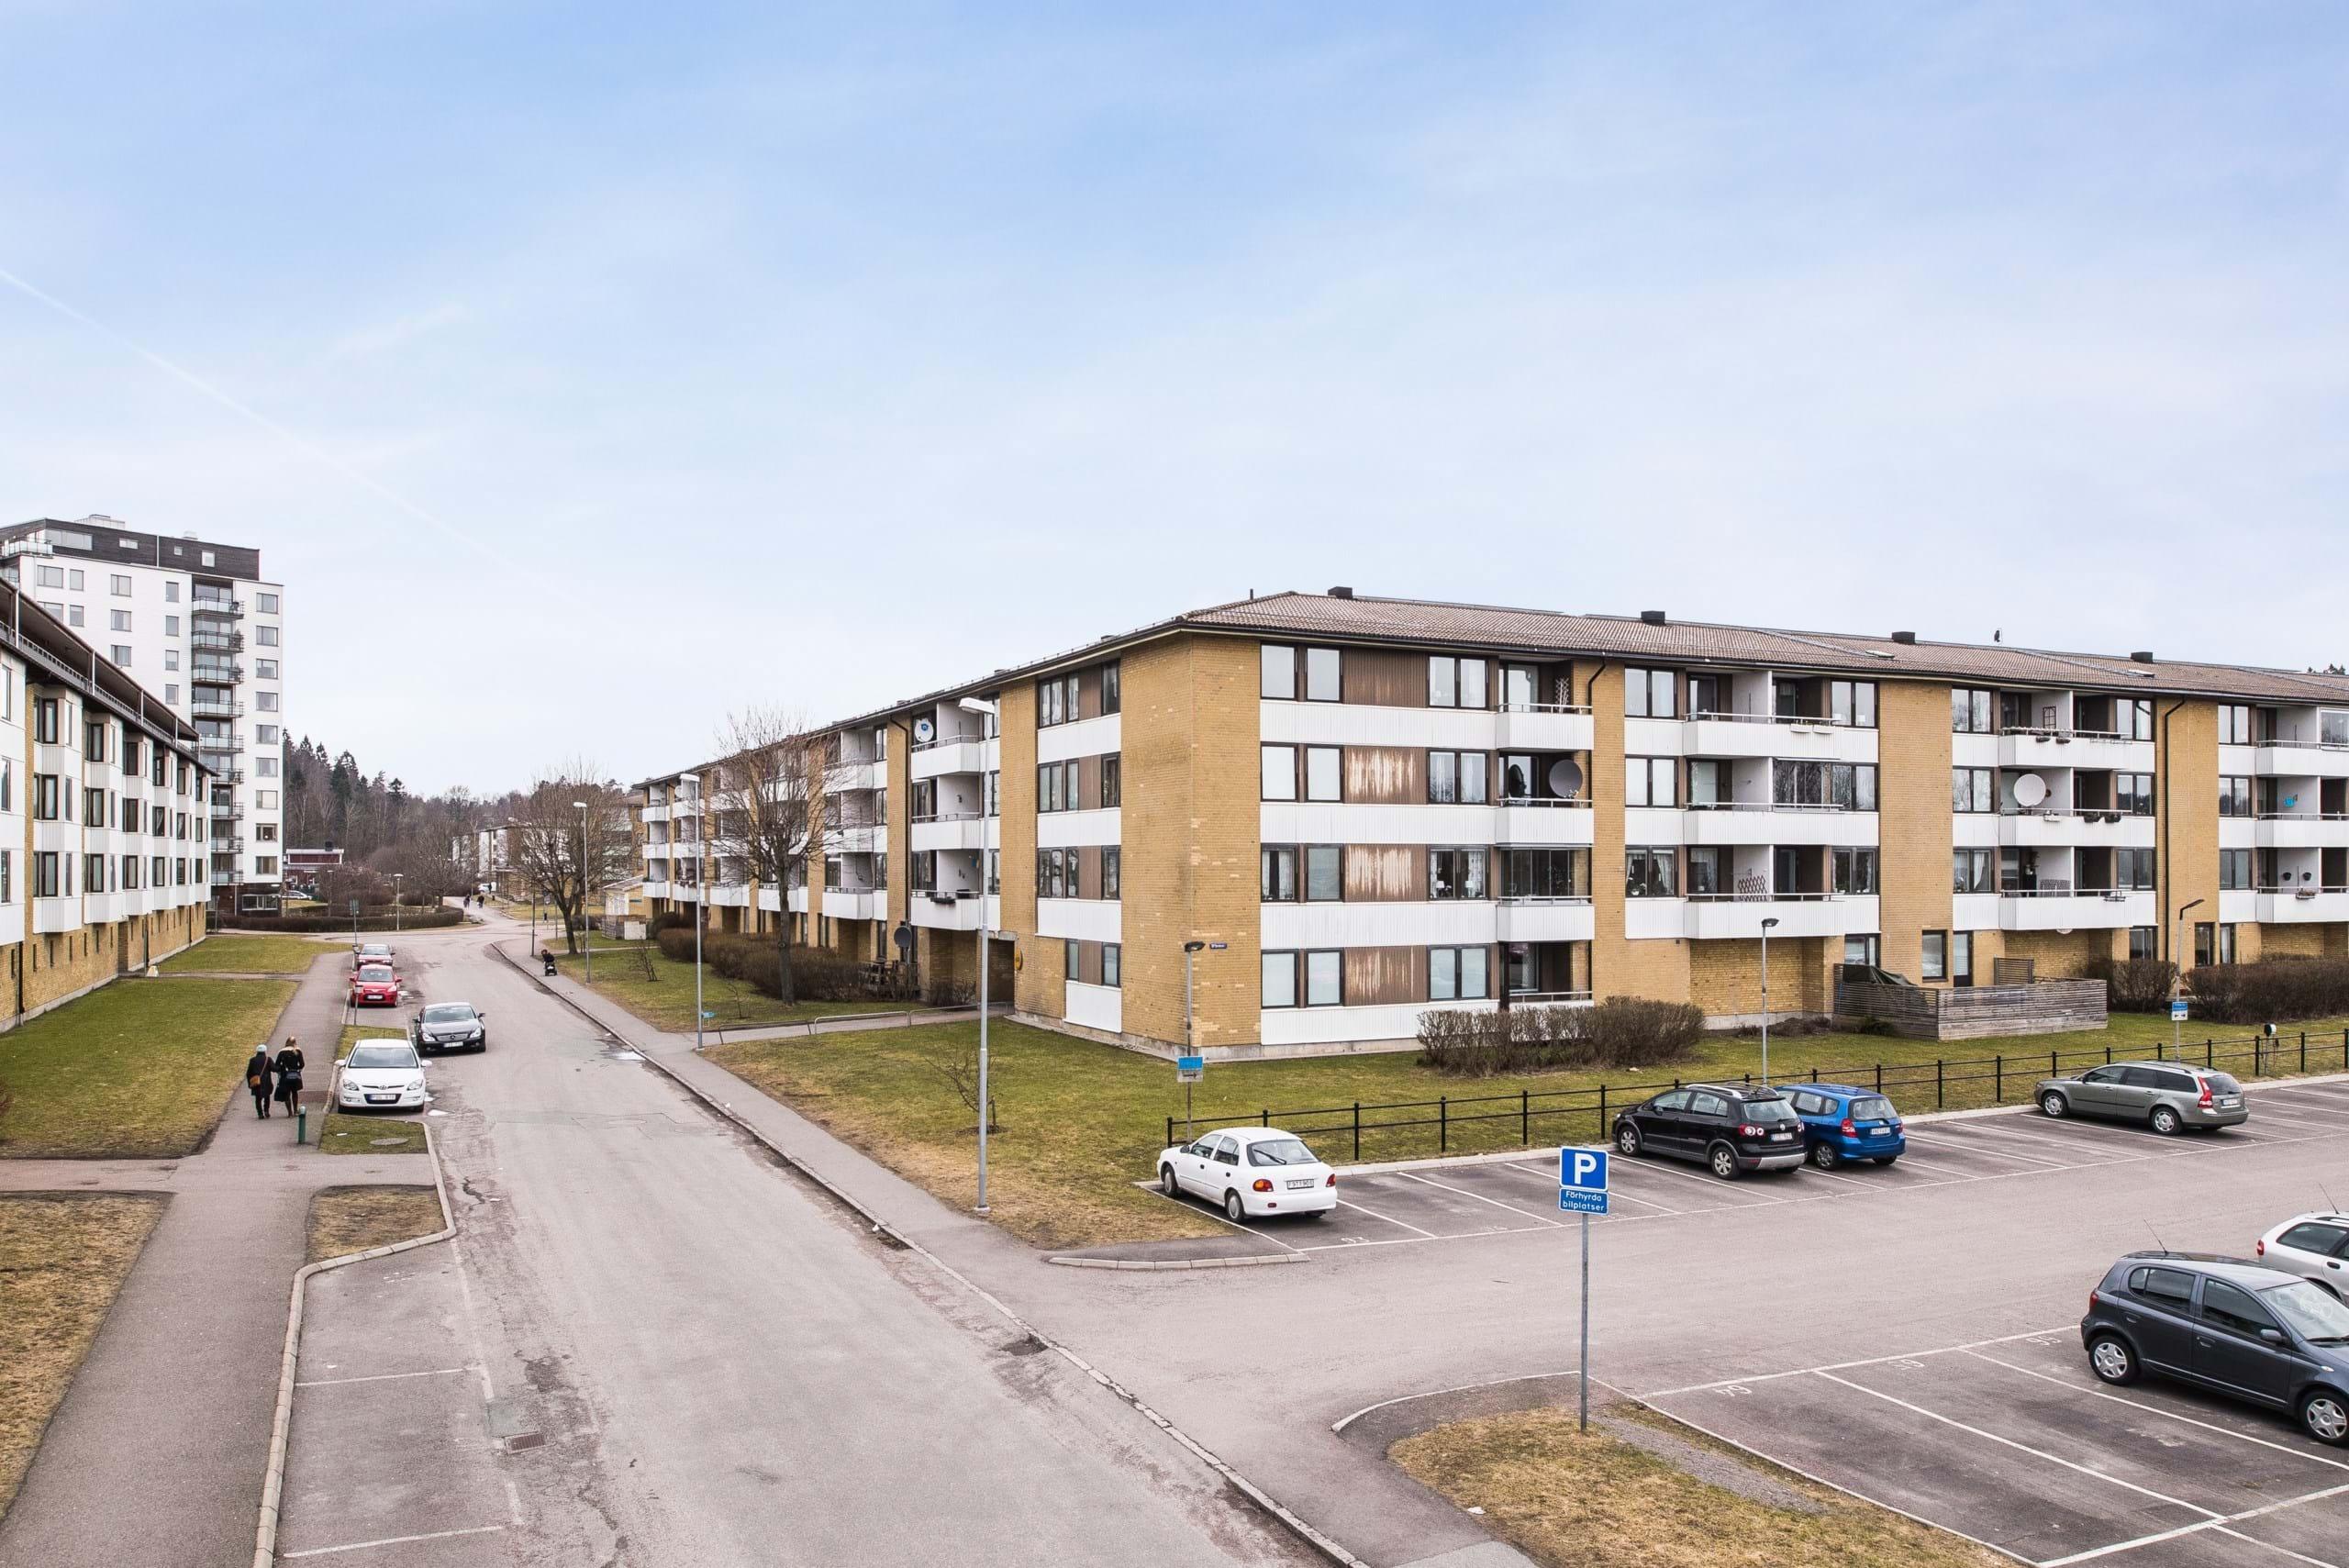 Kök marbodal göteborg ~ Zeedub.com